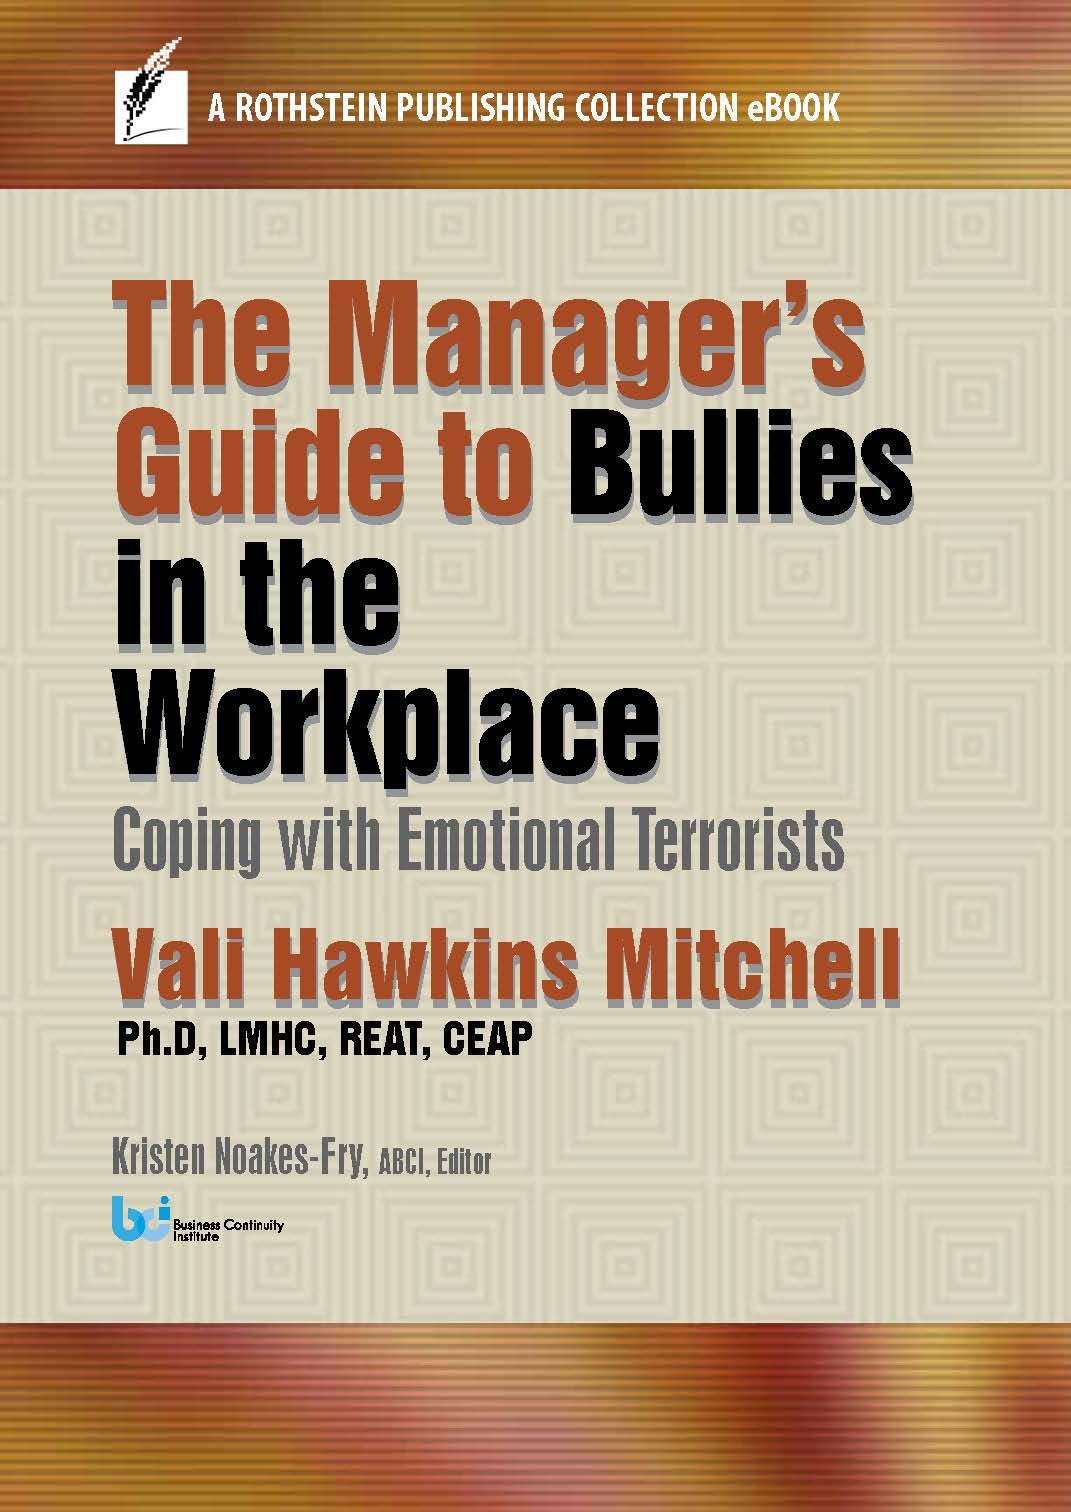 Vali-Bullies-eCover-FINAL.jpg